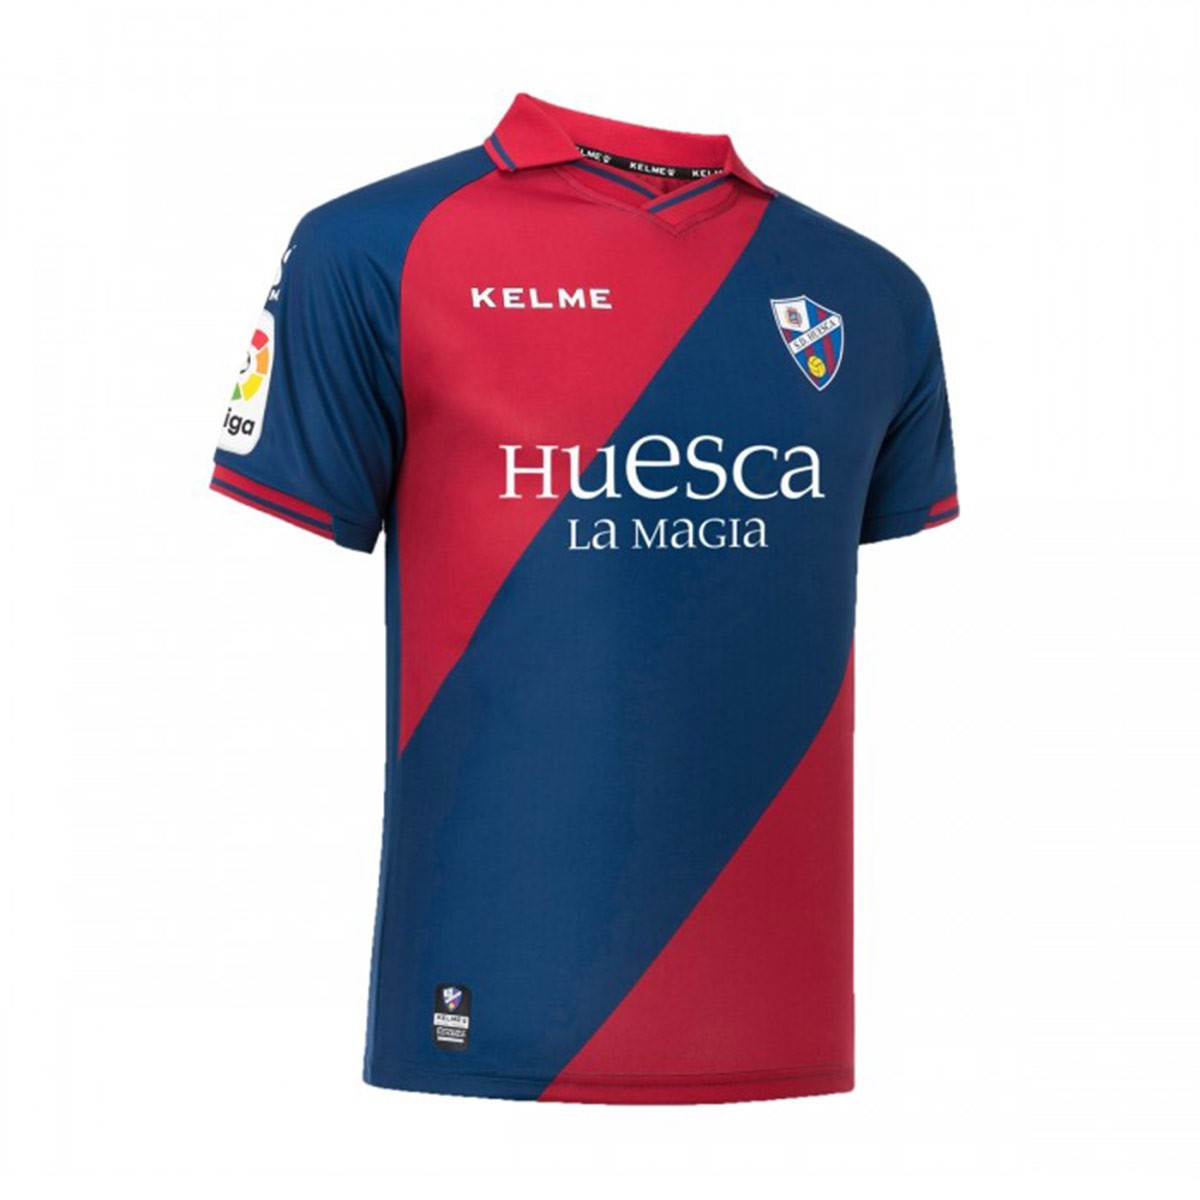 a63797a3c0a Jersey Kelme SD Huesca 2018-2019 Home Navy blue-Maroon - Football ...